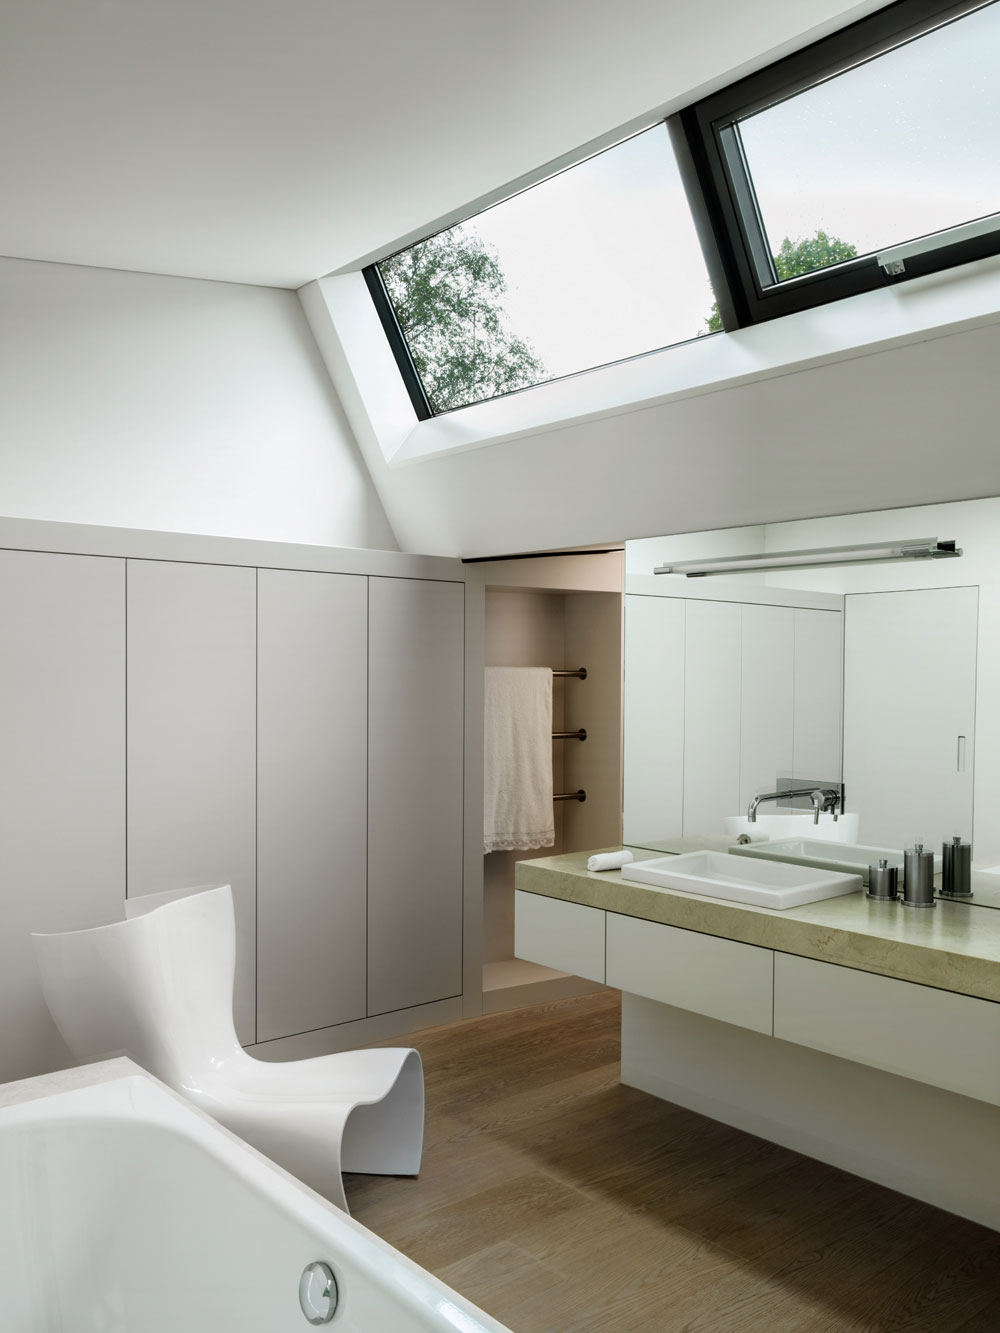 2LB House by Raphaël Nussbaumer Architectes (7)